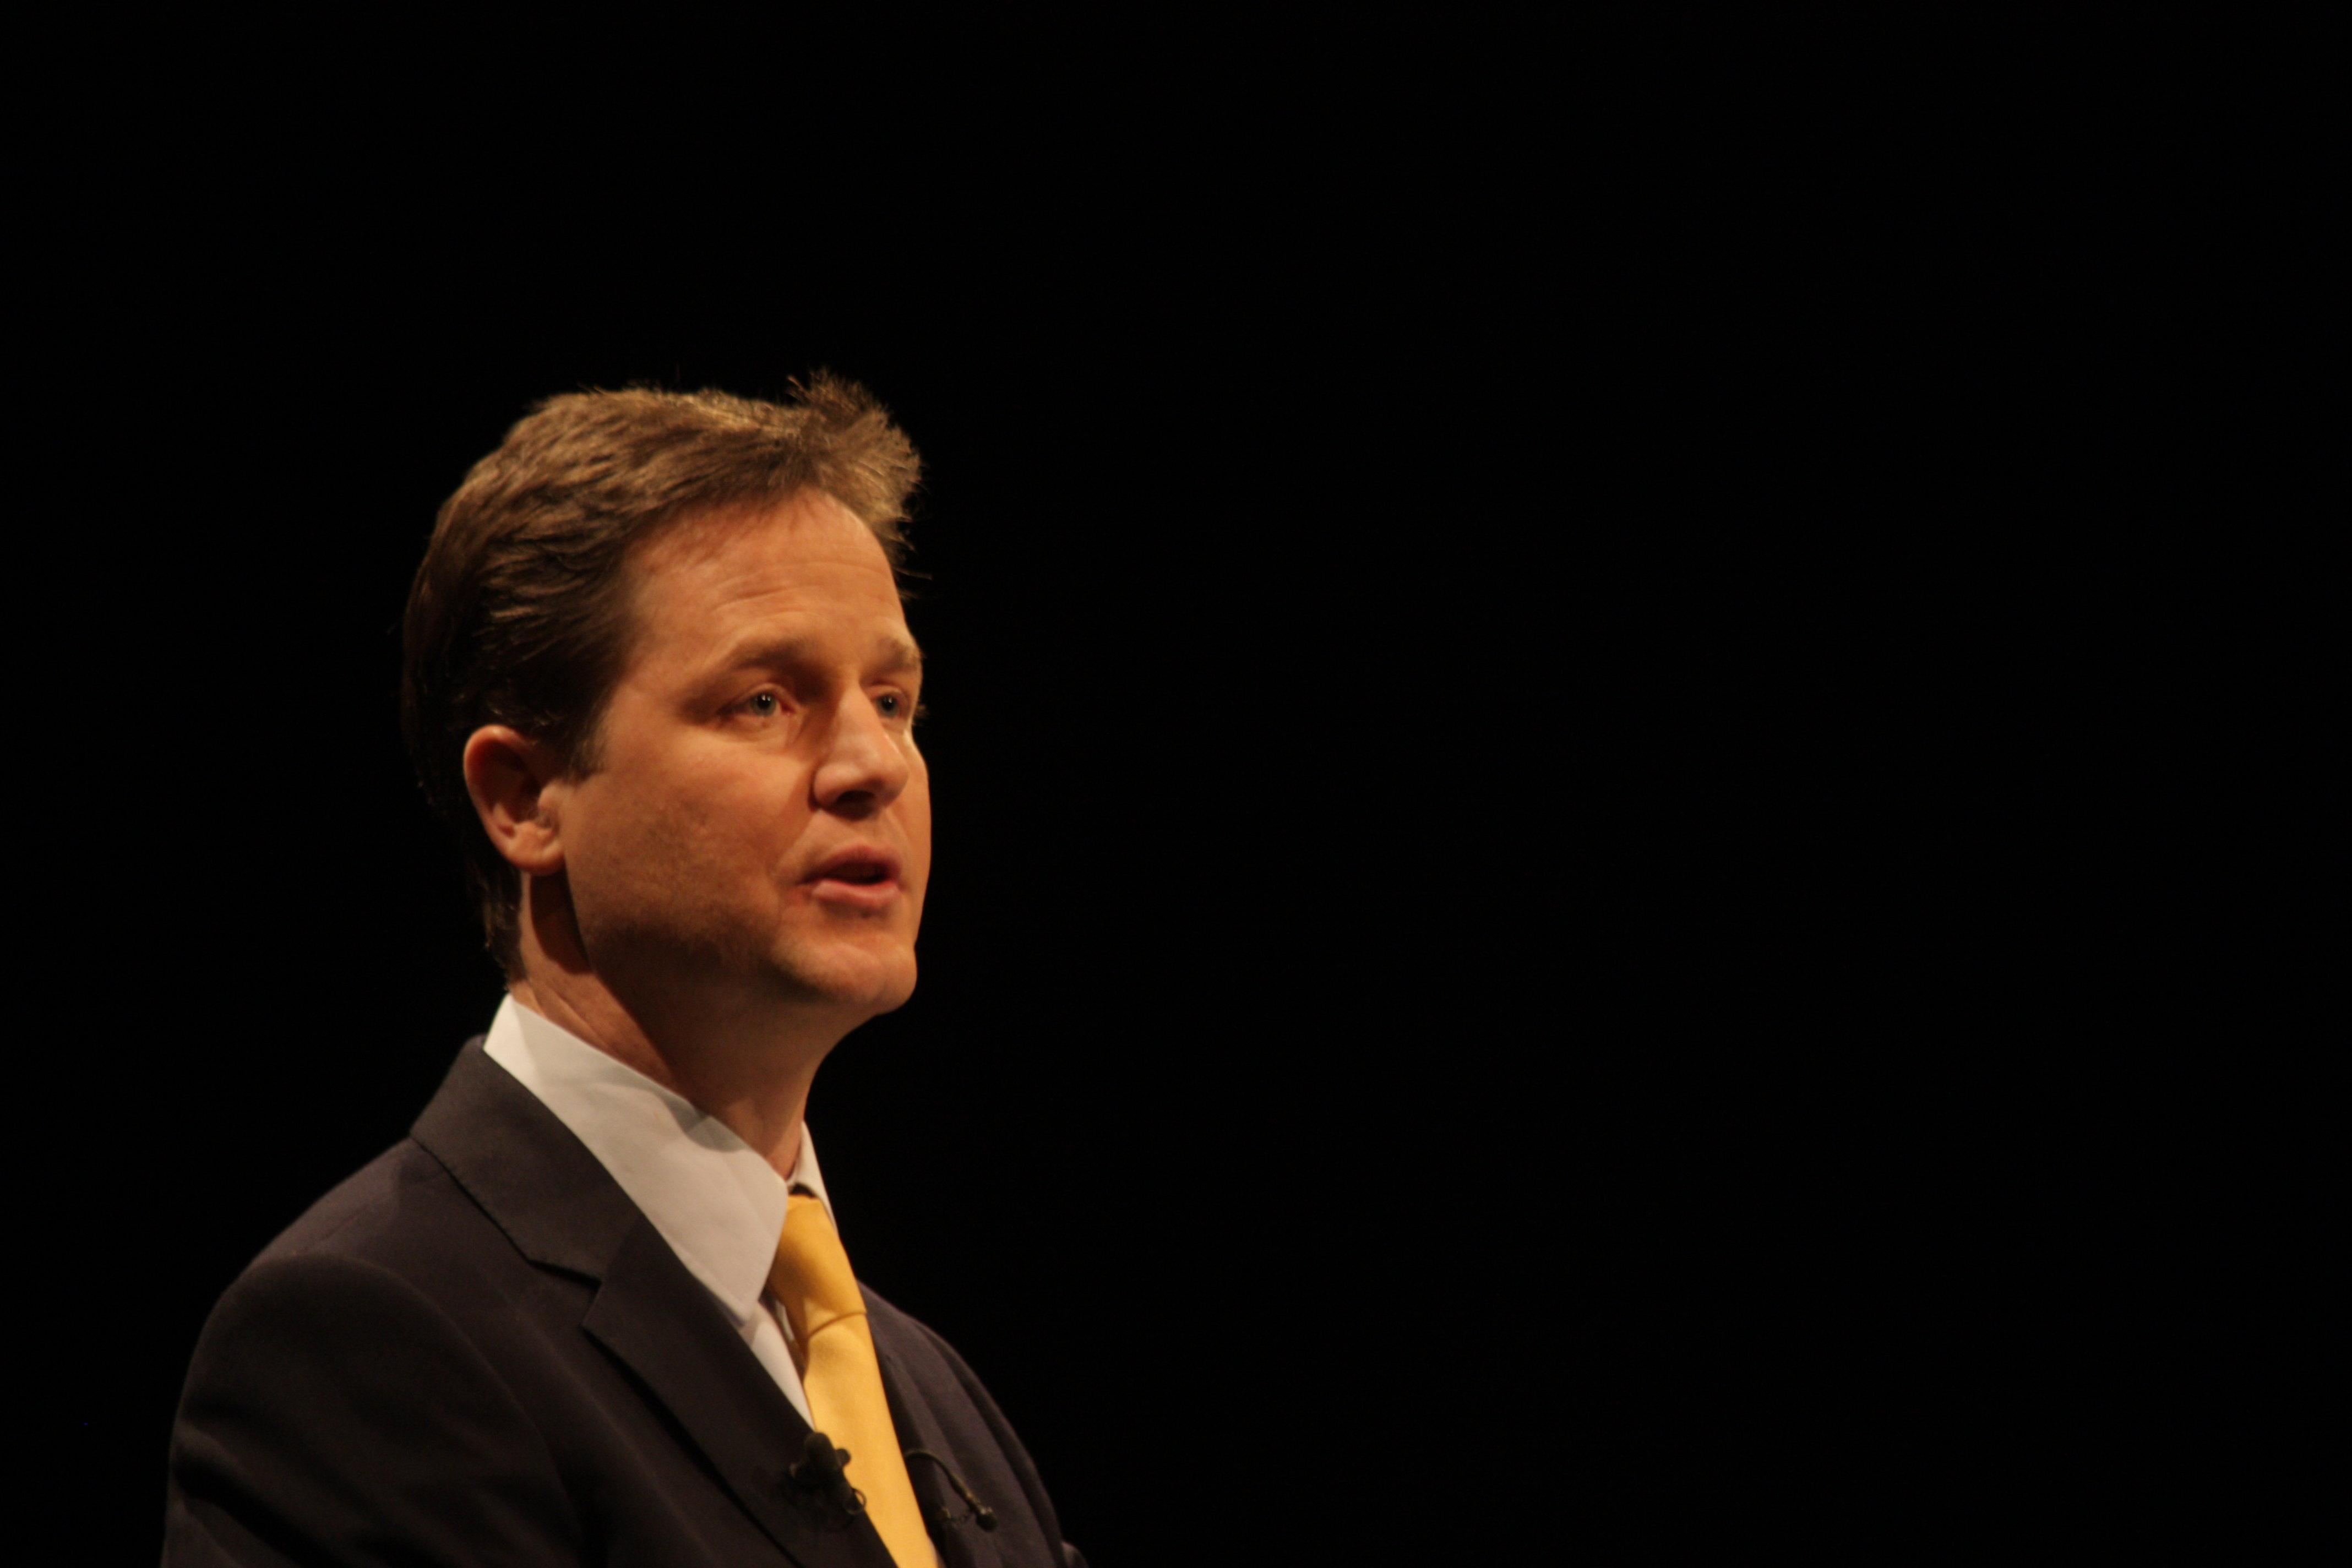 Clegg's bank-share giveaway plan needs tweaking